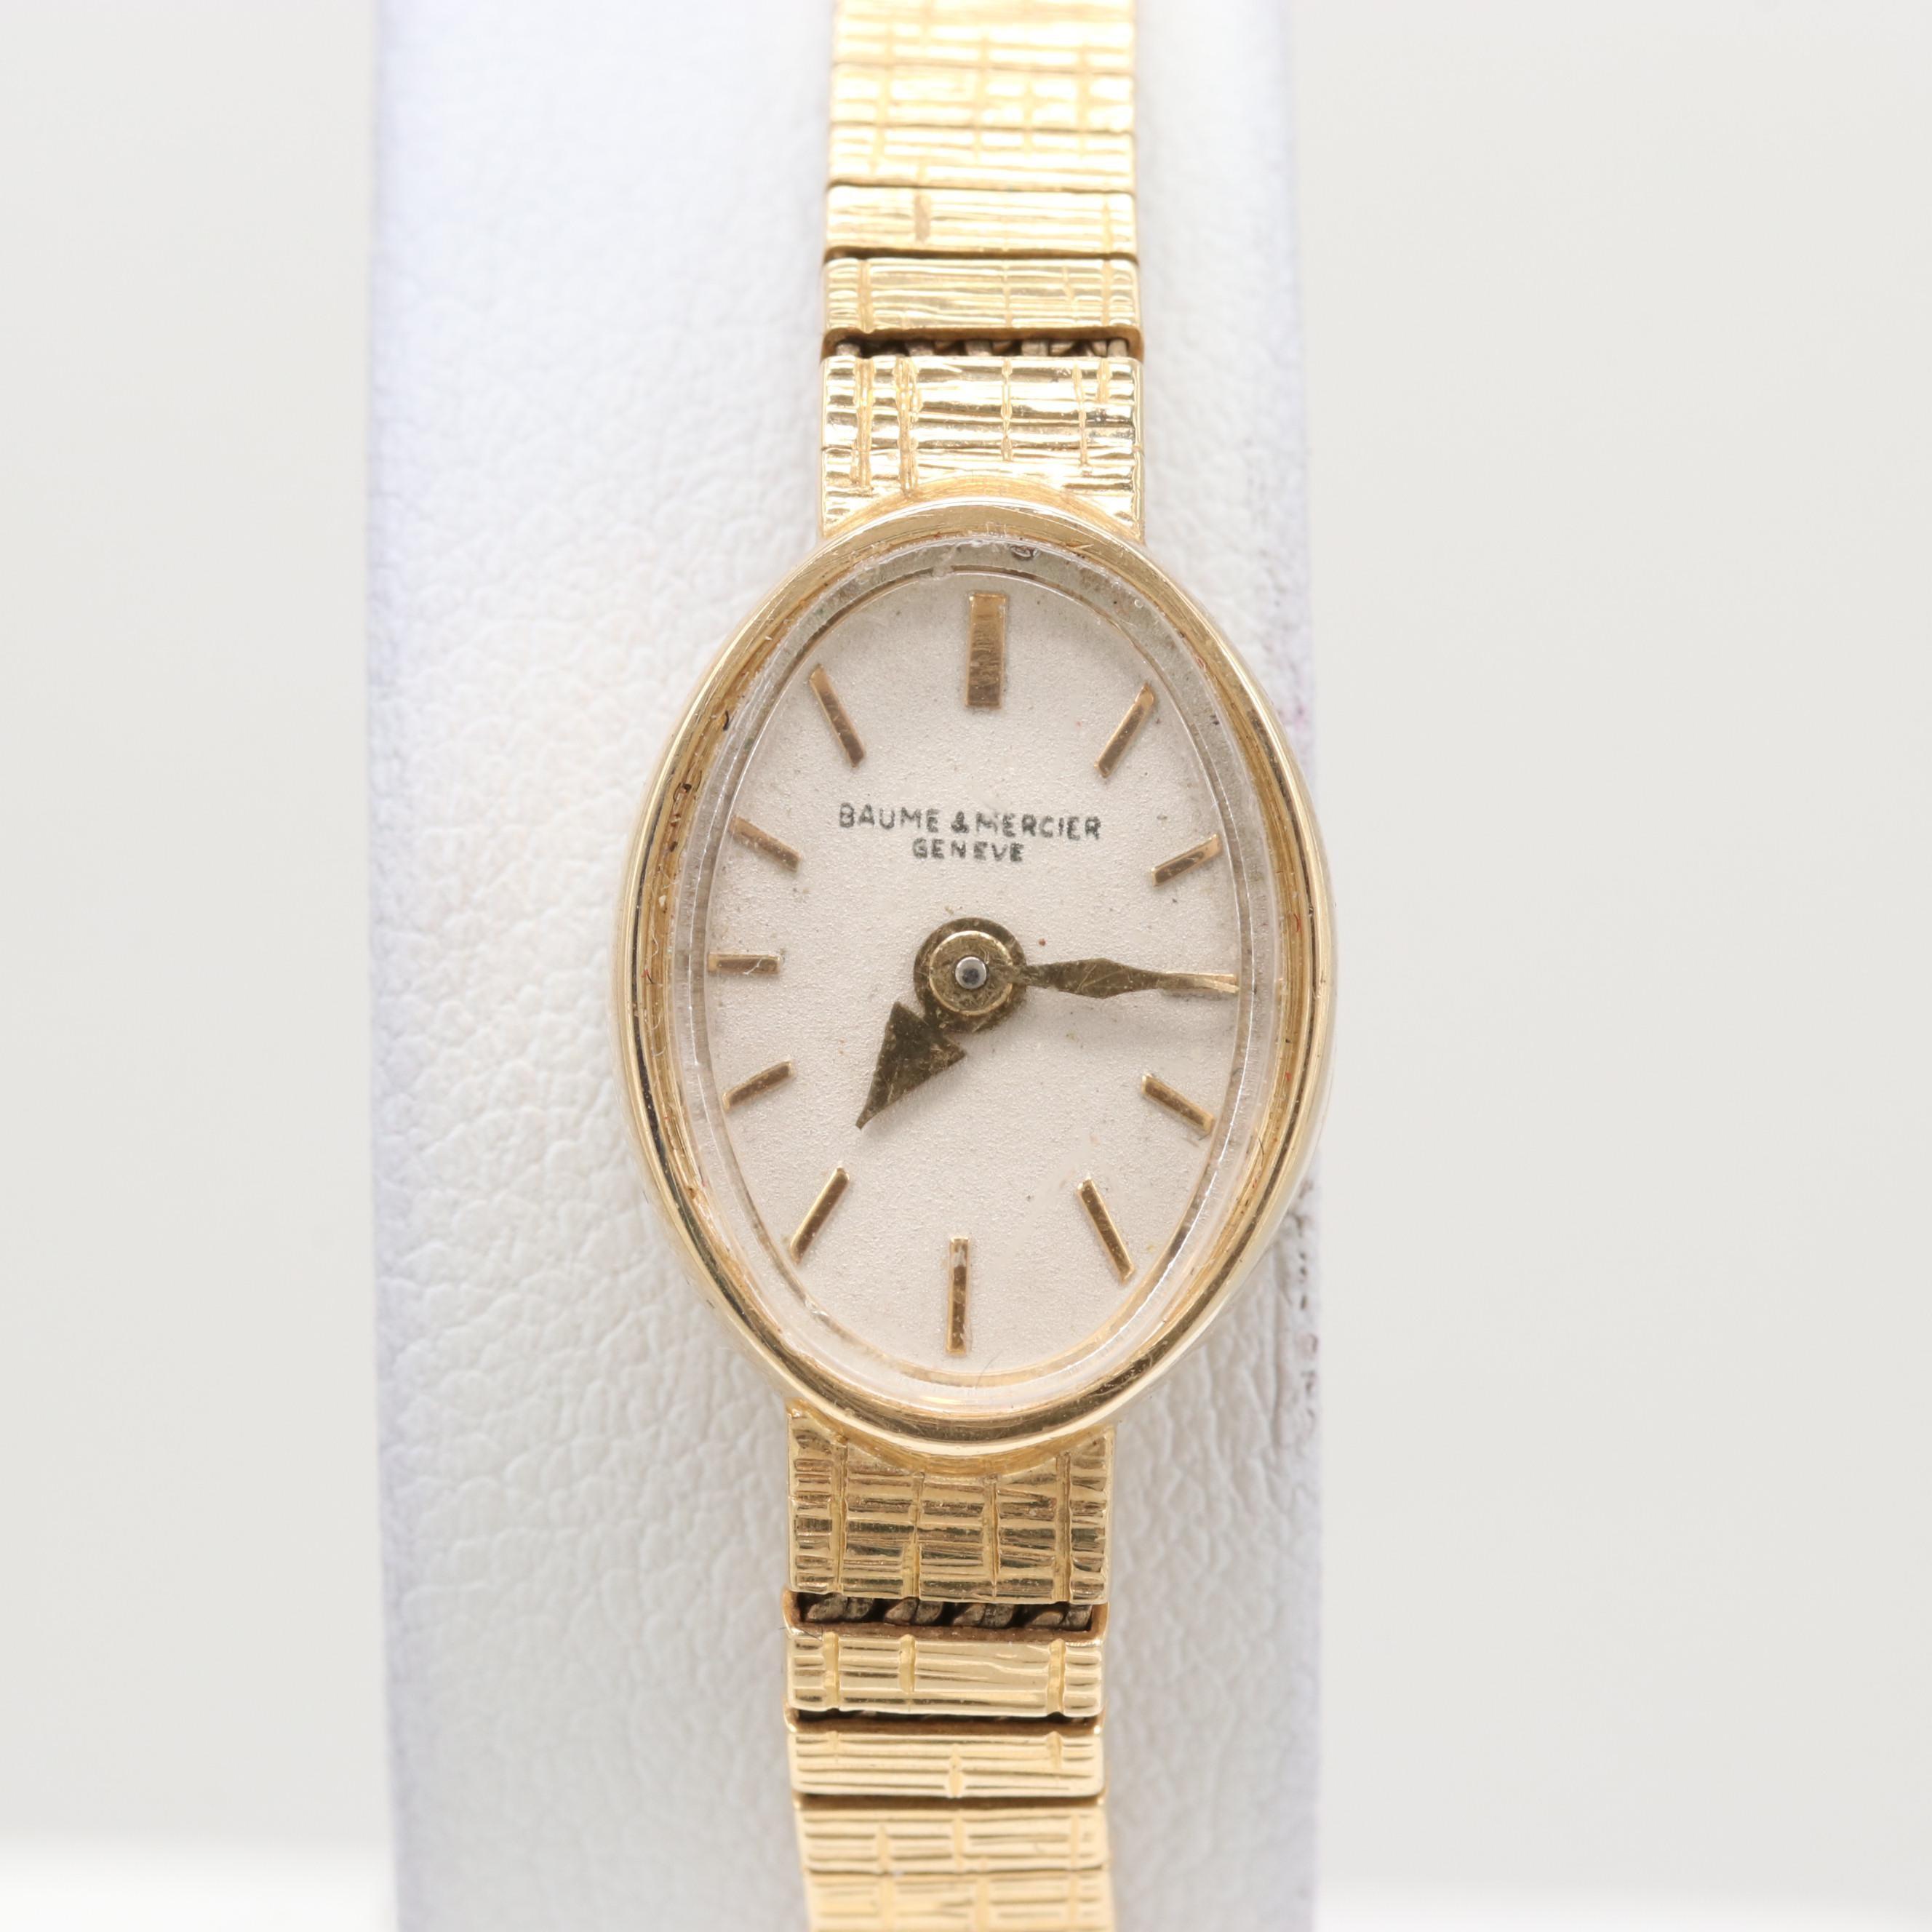 Vintage Baume & Mercier 14K Yellow Gold Wristwatch